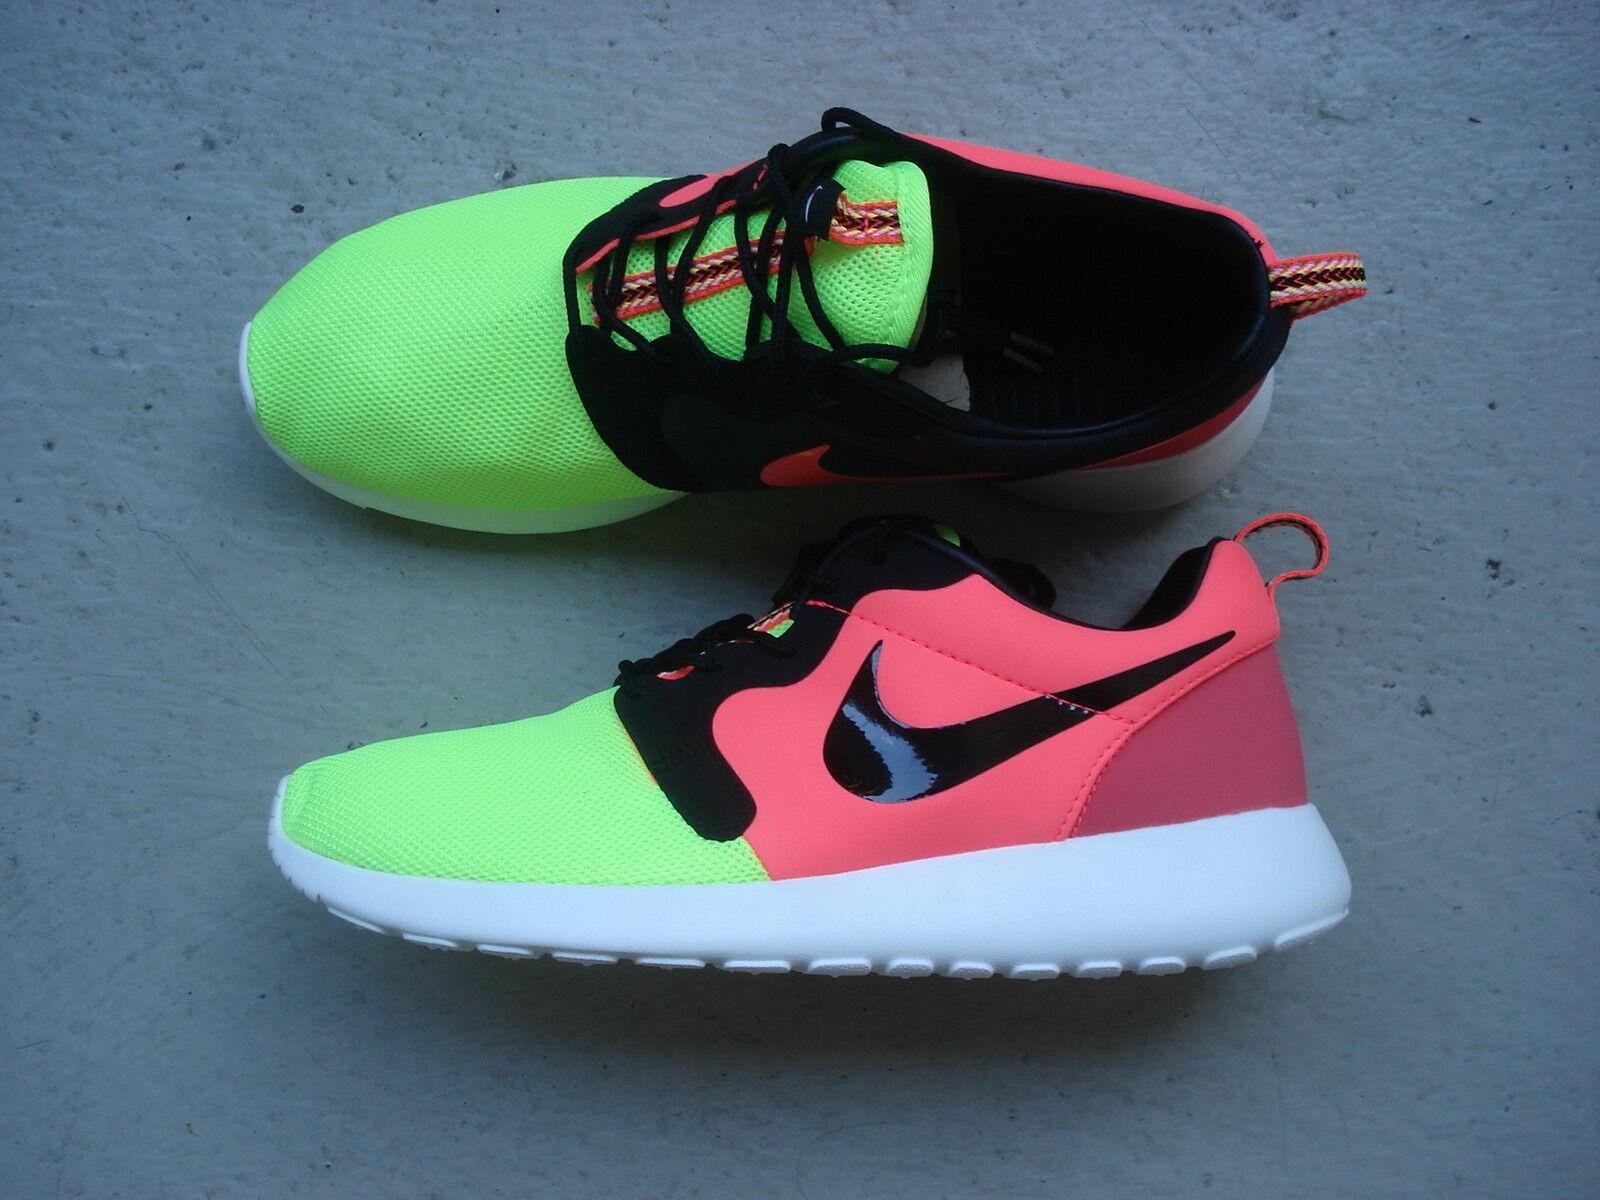 Nike Air Roshe Run HYP Premium QS 44 Volt Black-Hyper Punch